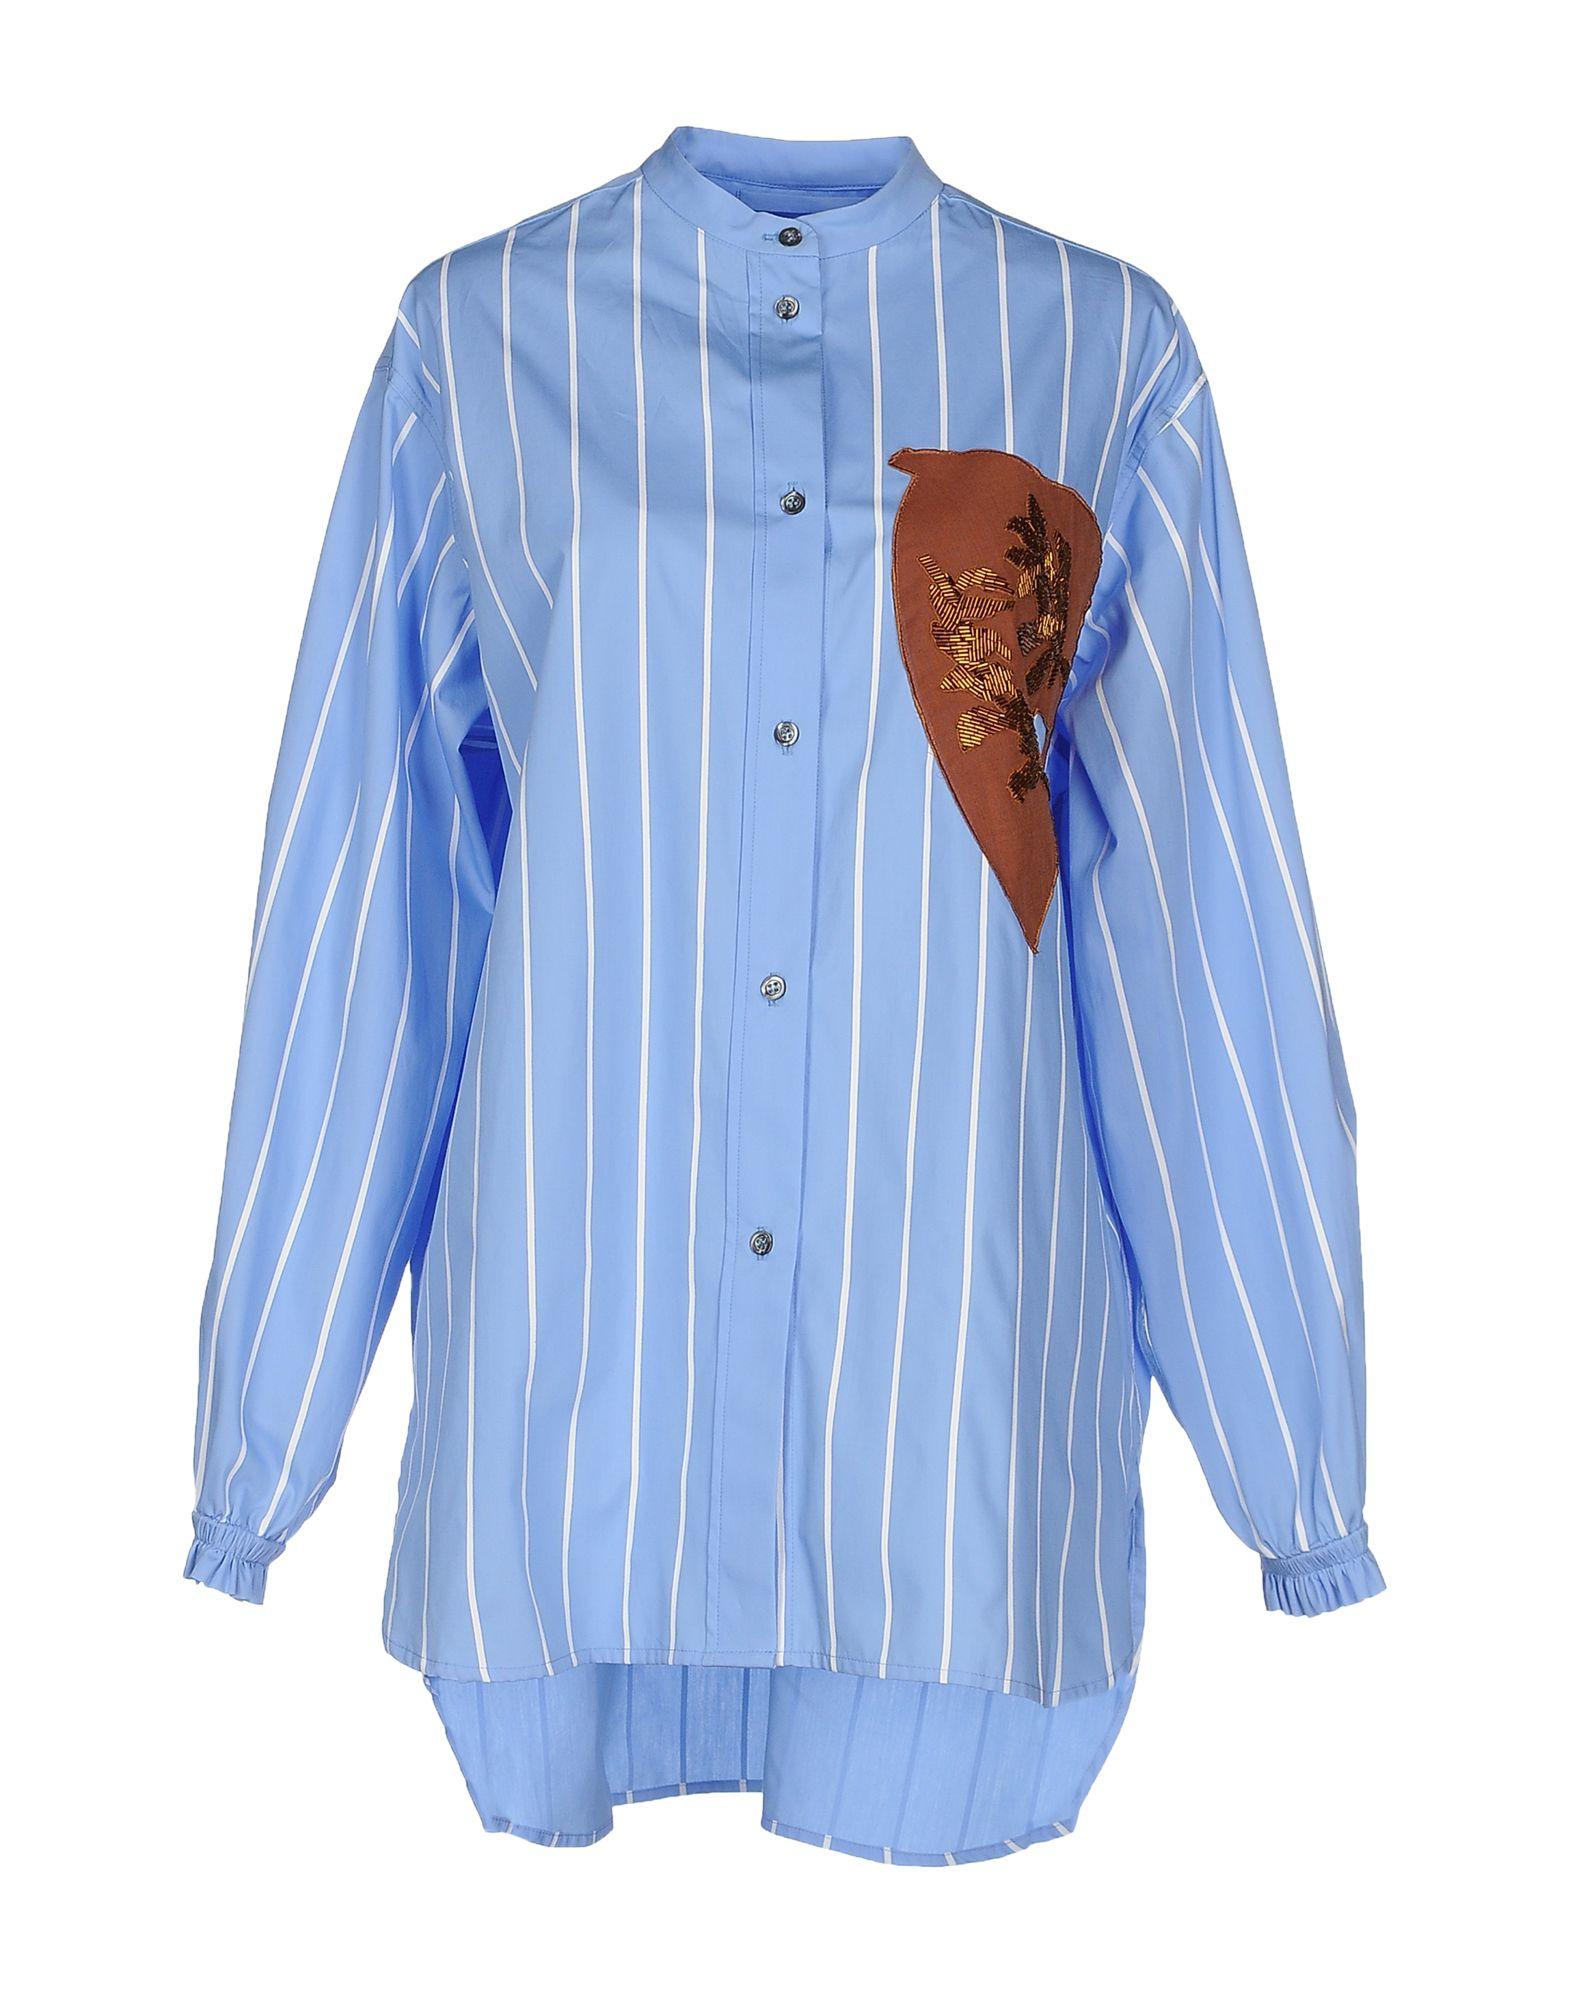 JONATHAN SAUNDERS Pубашка jonathan simkhai повседневные шорты